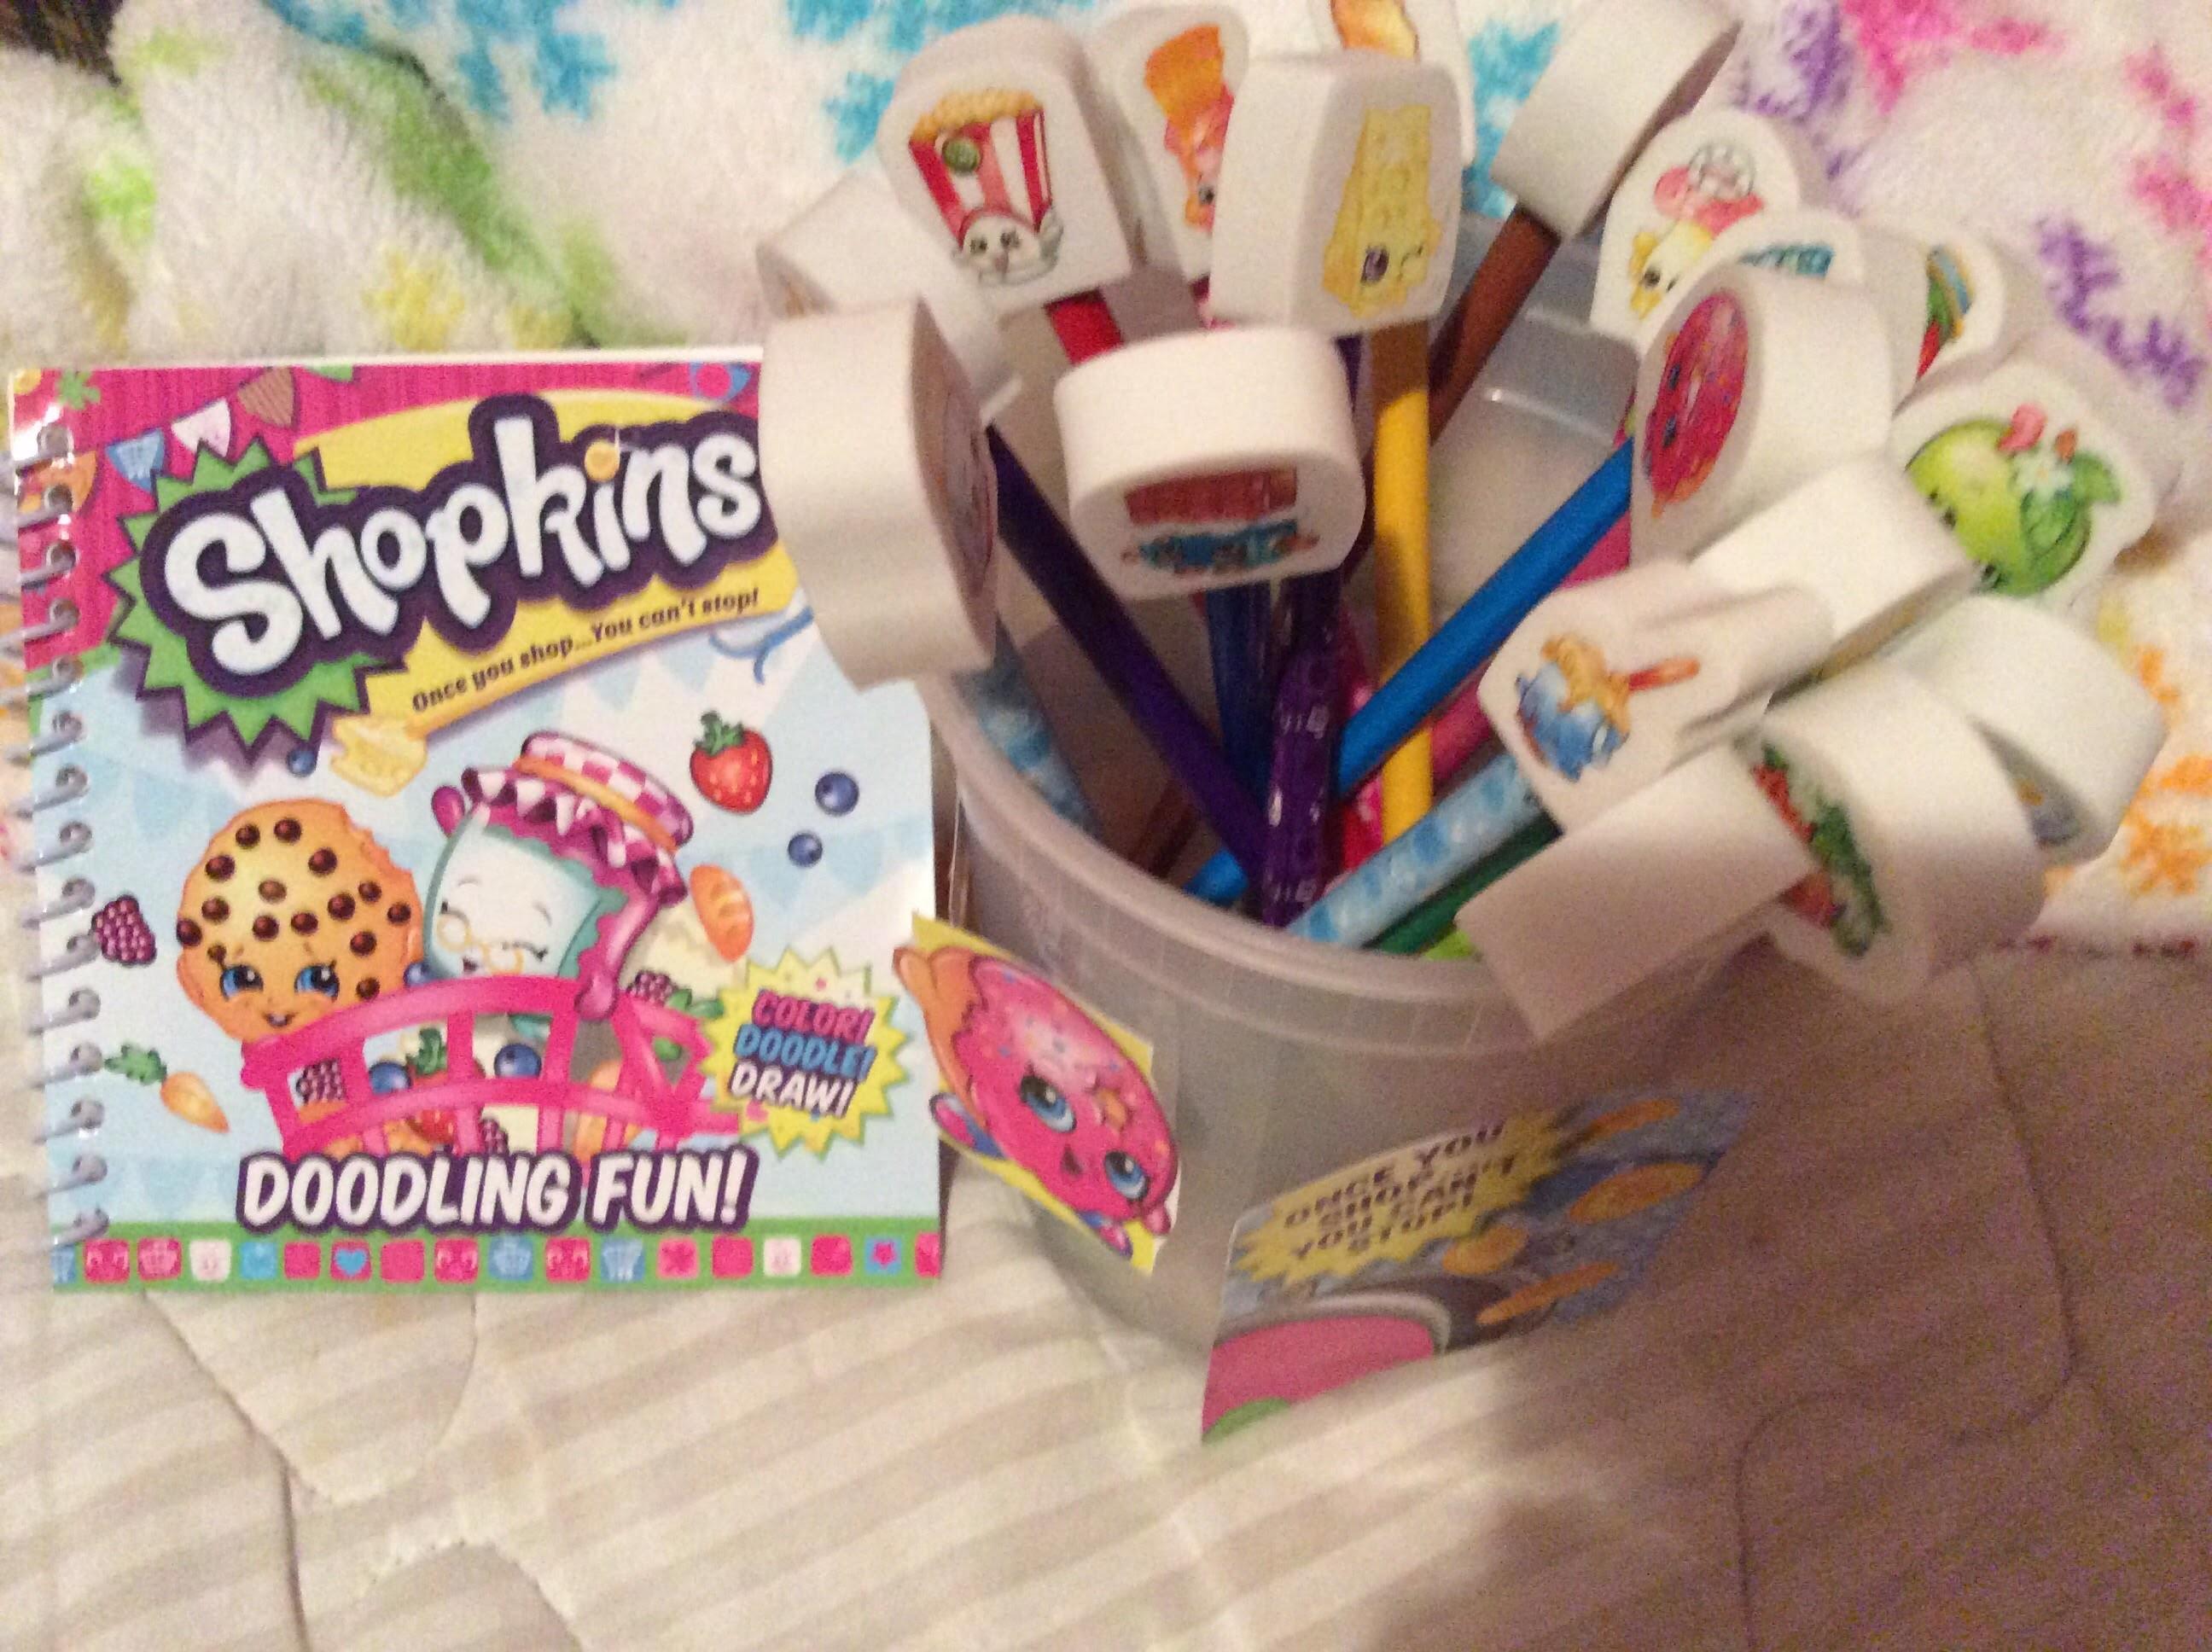 Shopkins NEW 20 Colored & Regular Pencils, Coloring Notebook & DIY CRAFT